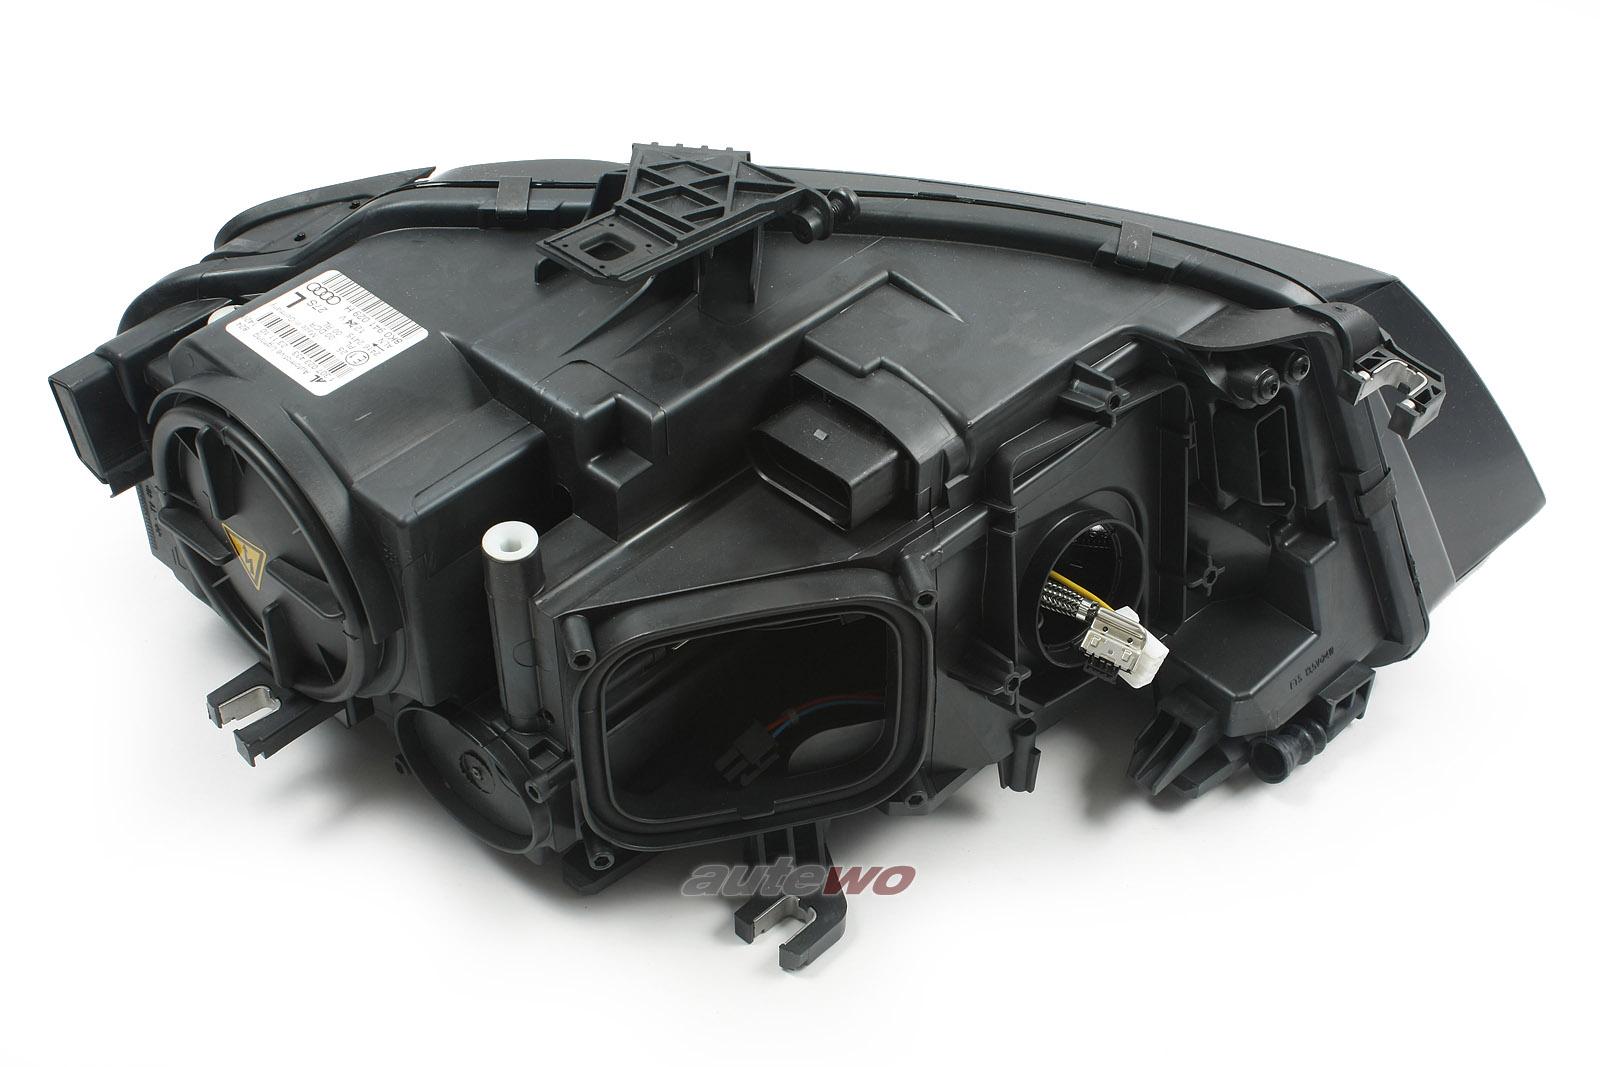 8K0941029AN/H NEU Audi A4/Allroad 8K Bixenon-Scheinwerfer RHD Links